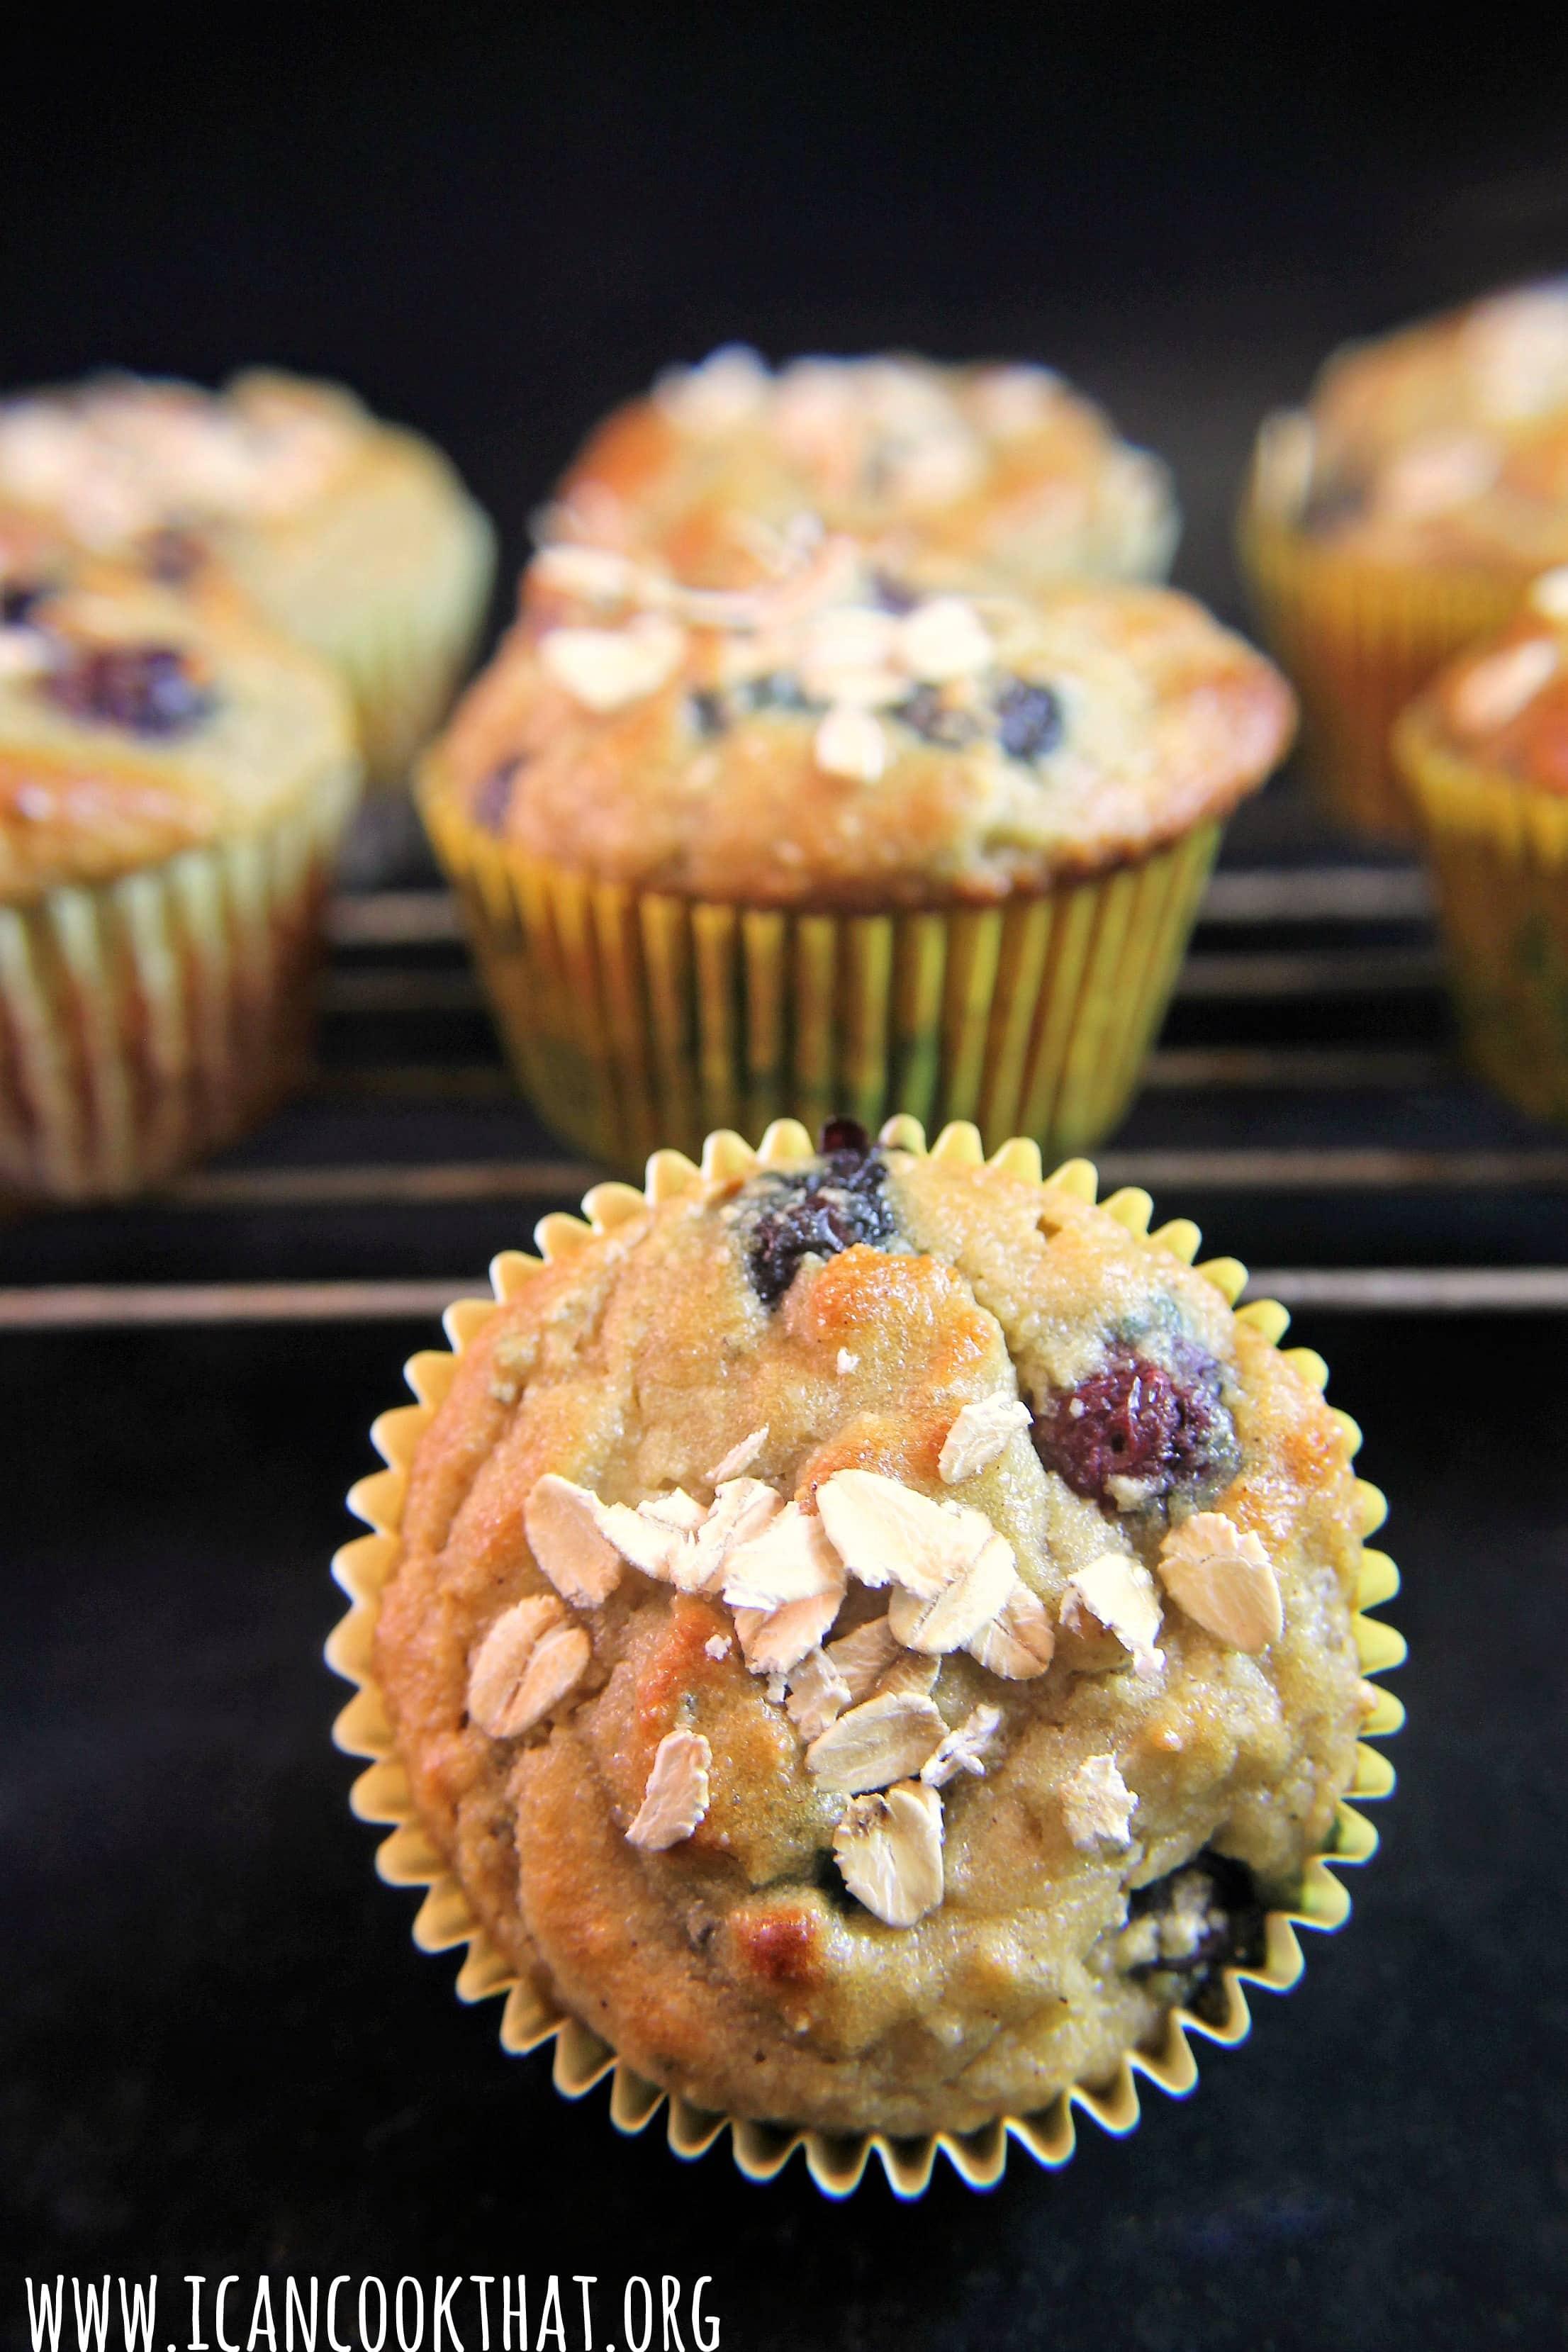 Blueberry Almond Flour Muffins